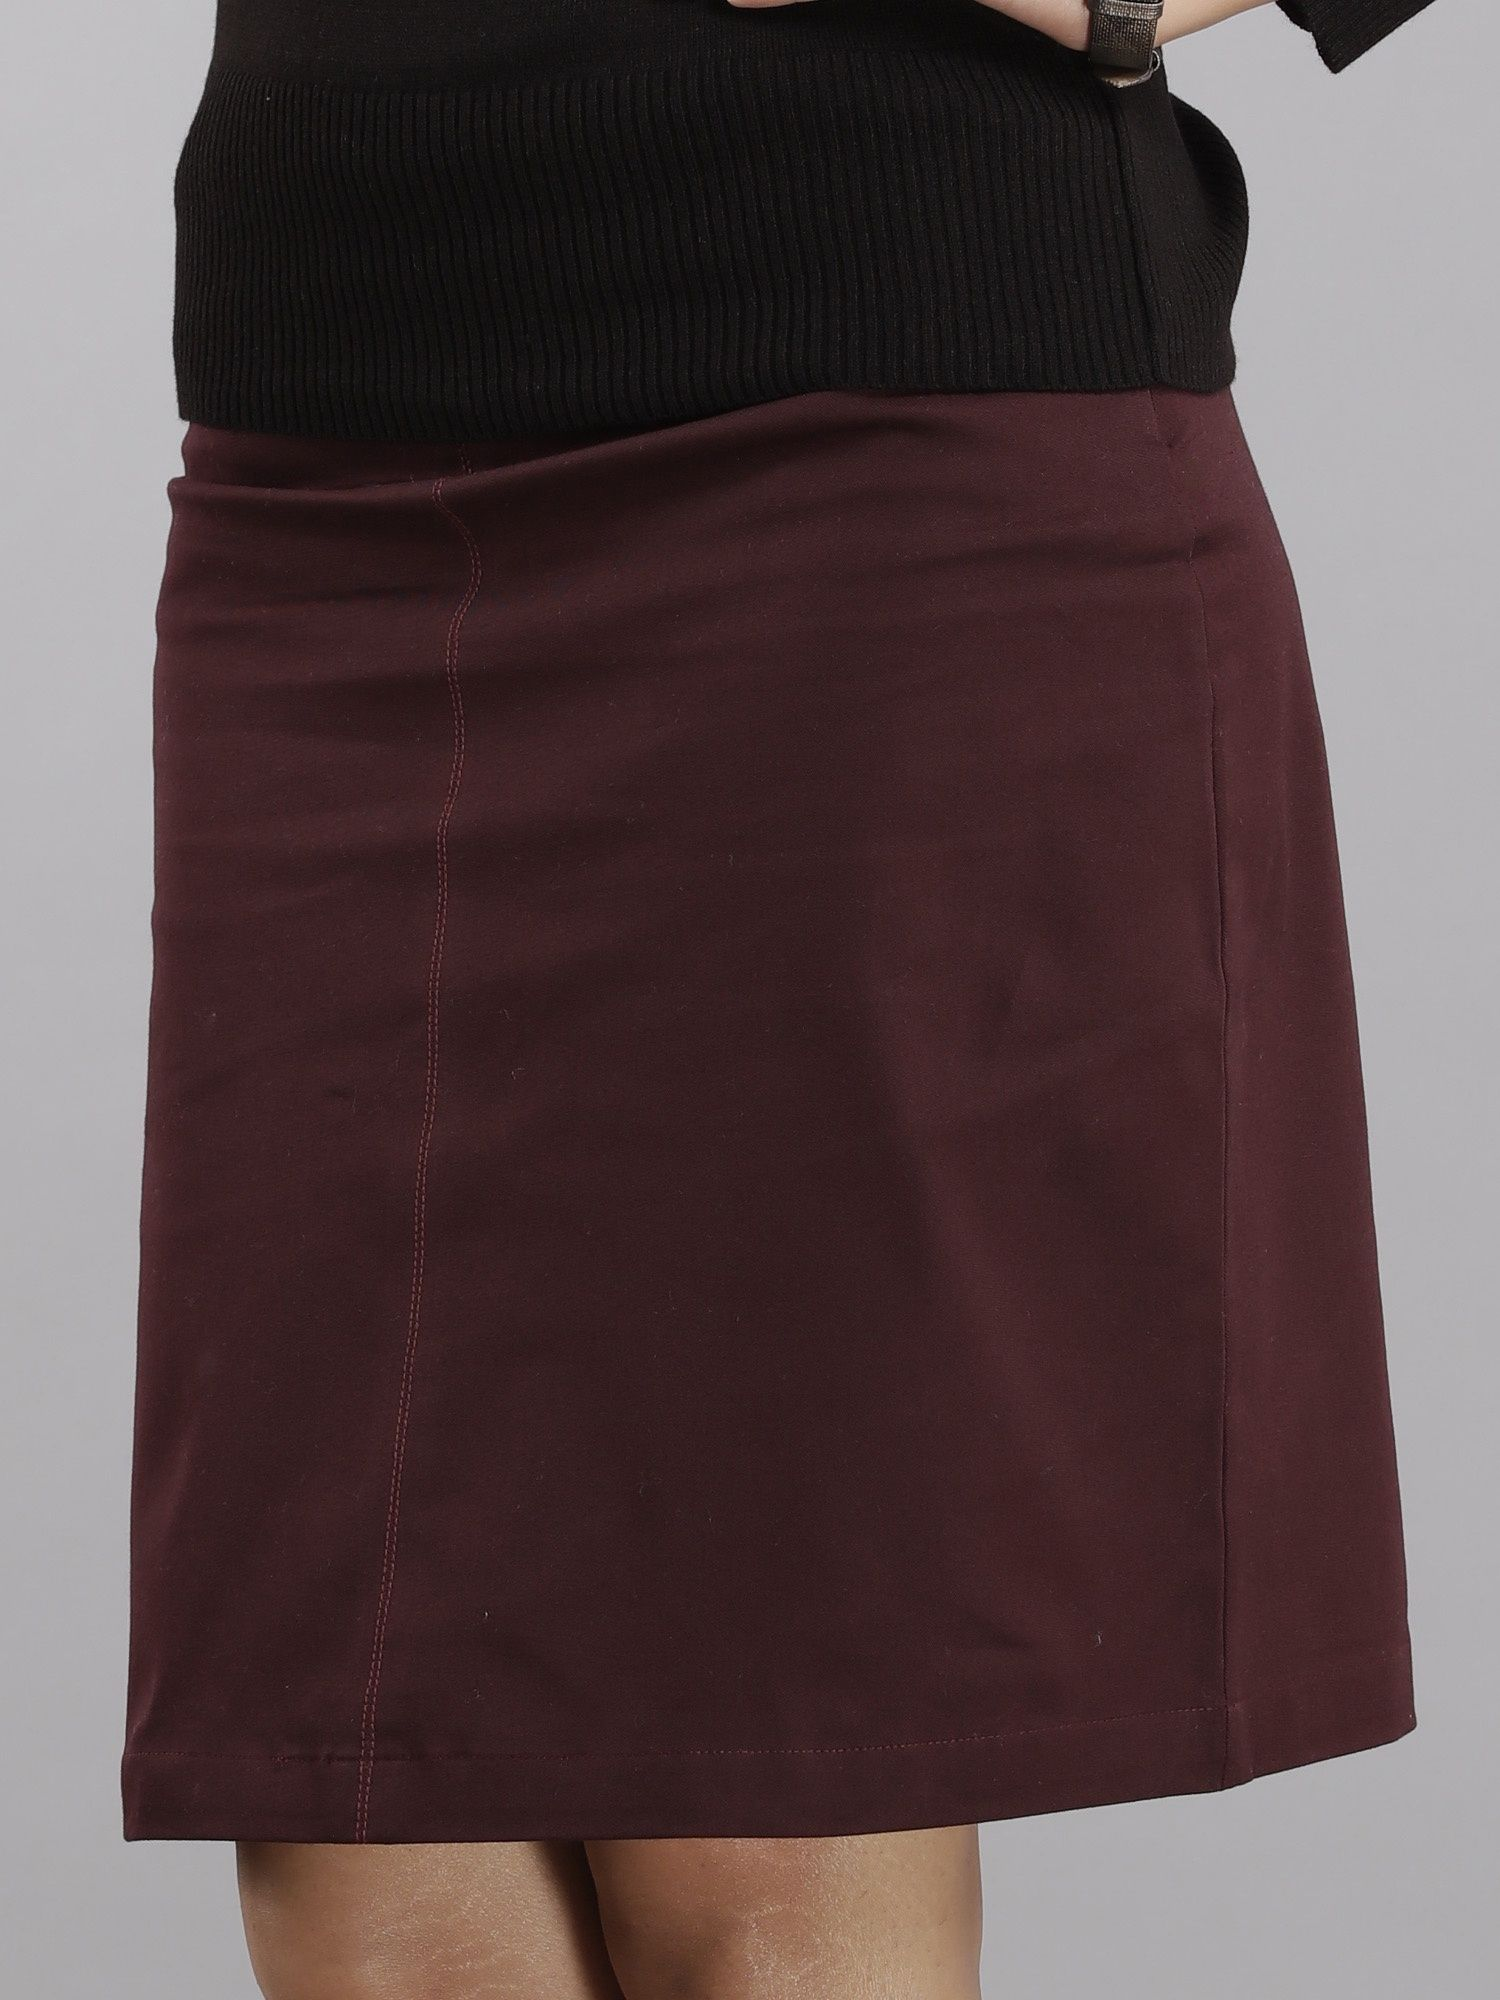 5b108bf431 FableStreet Skirts : Buy FableStreet A Line Skirt - Maroon Online ...